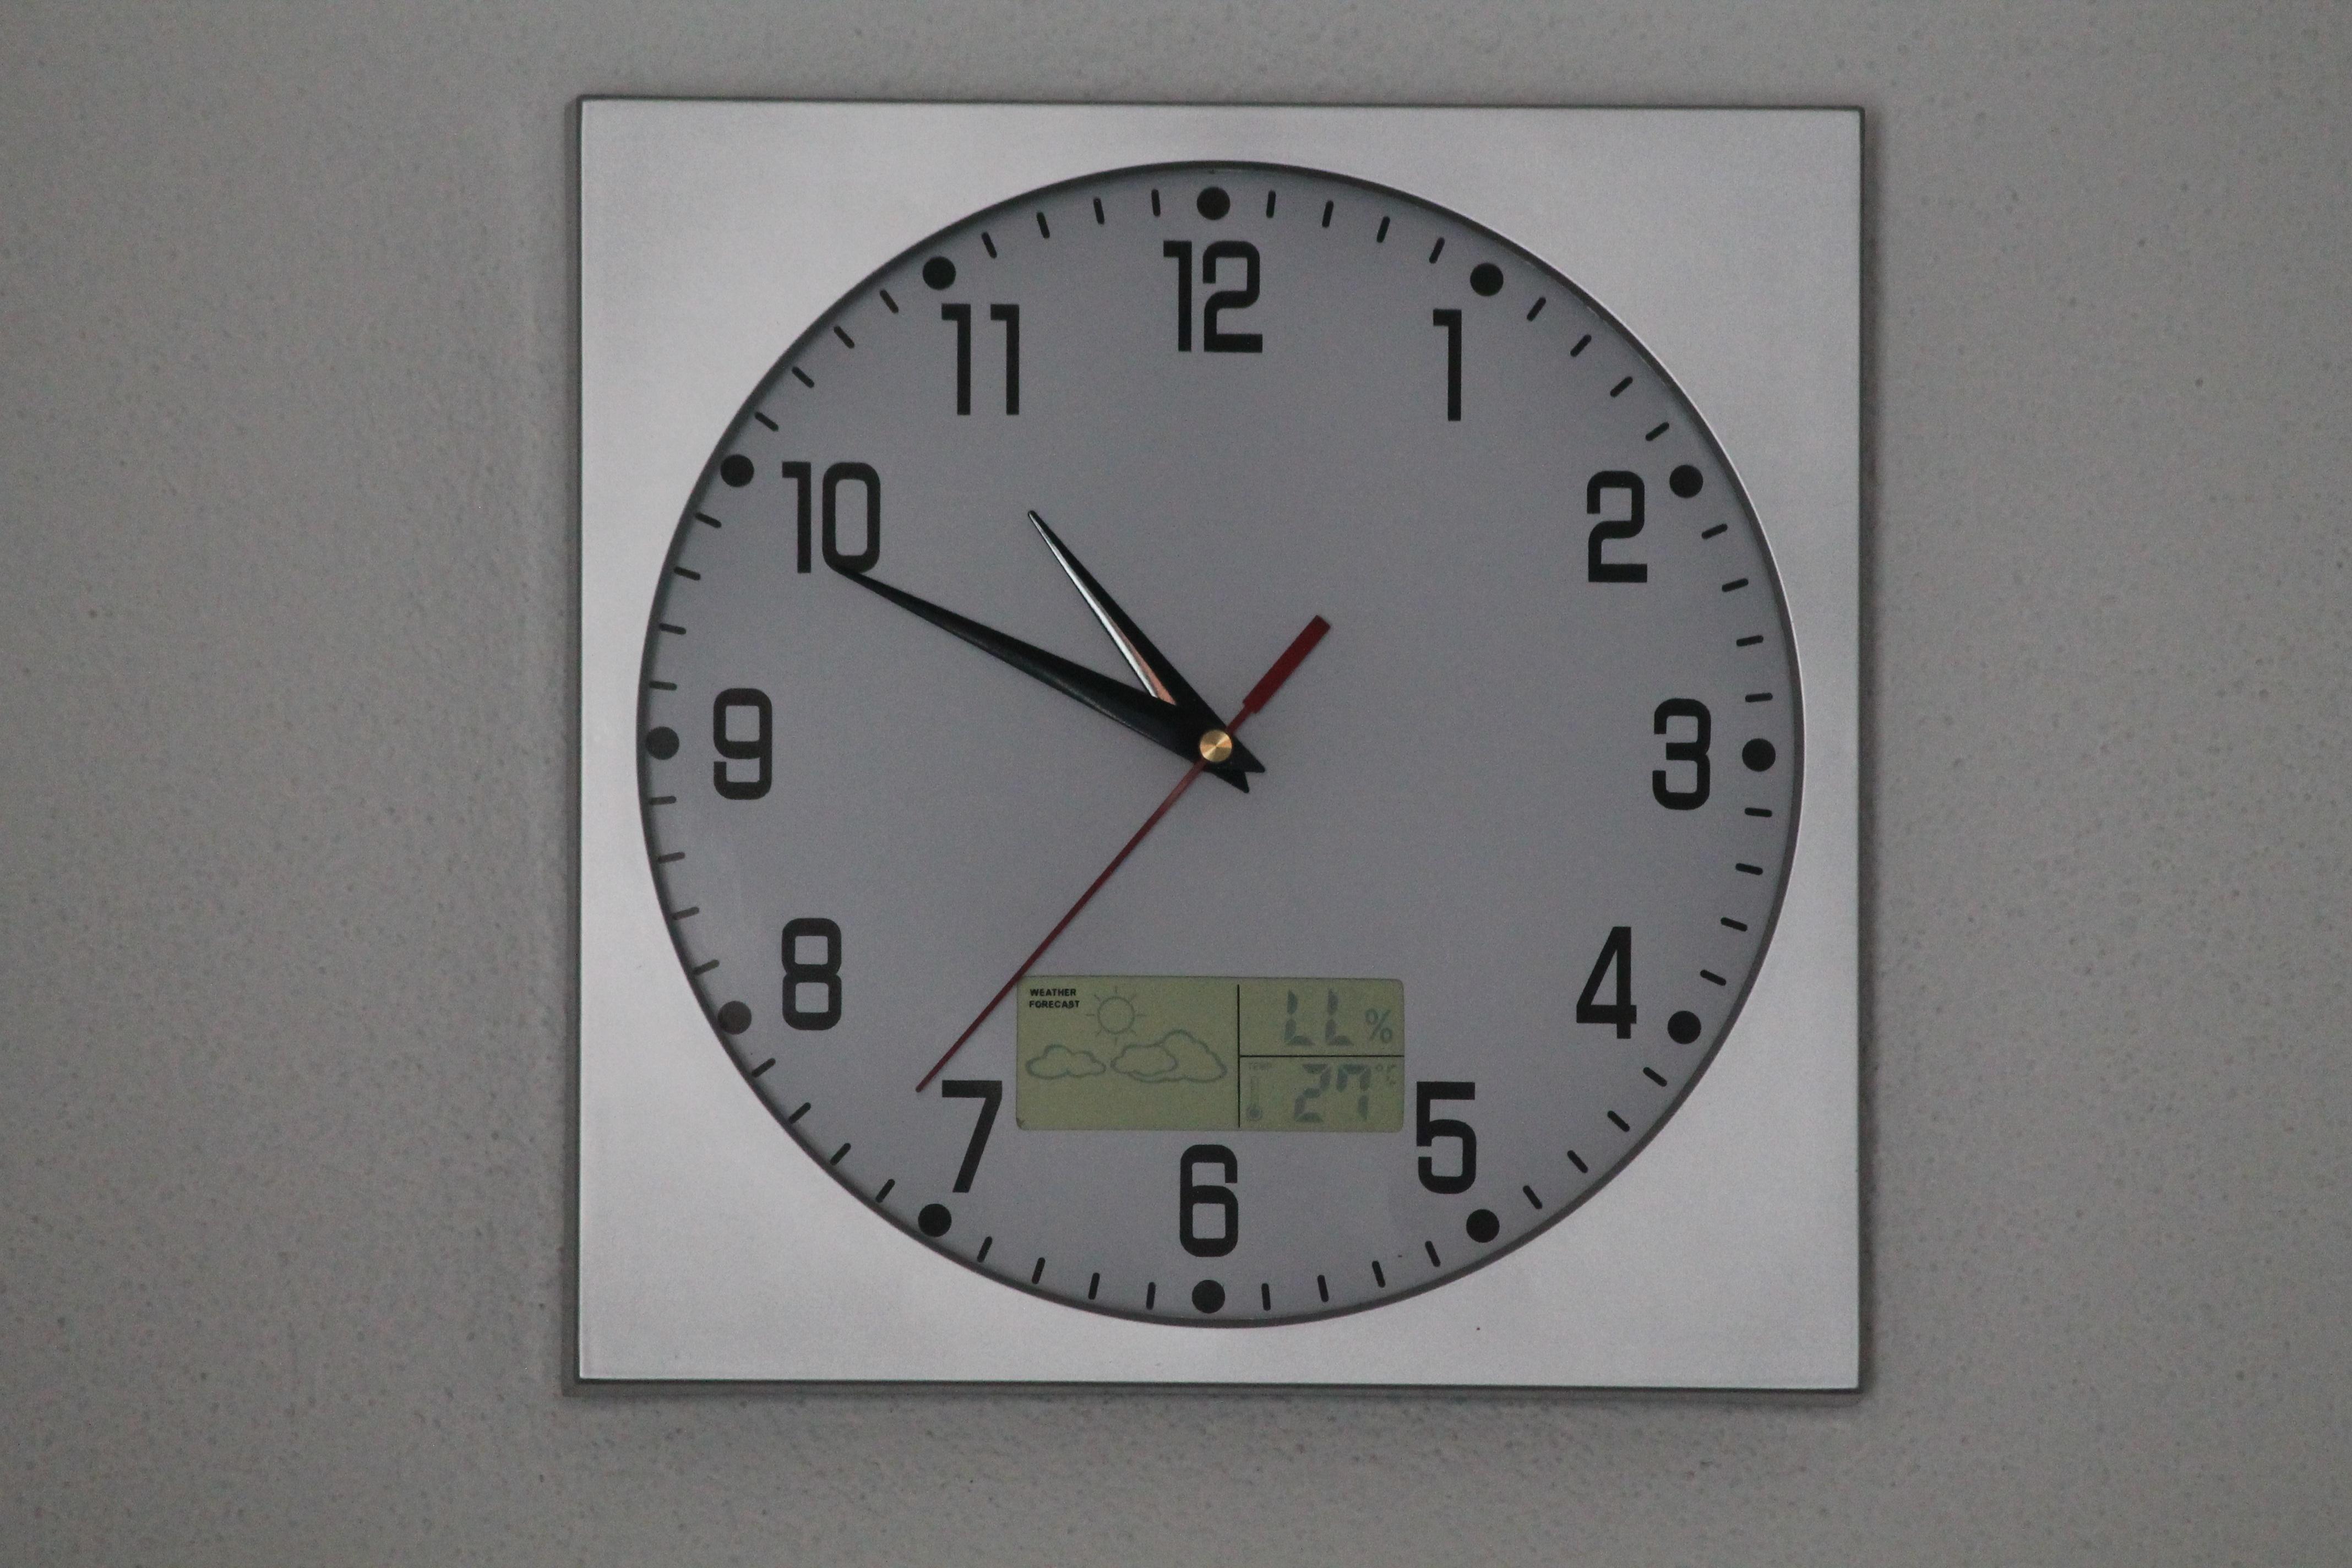 Fotos Gratis Reloj Mano N Mero Pared Cosa An Loga  # Muebles Num Decoracion